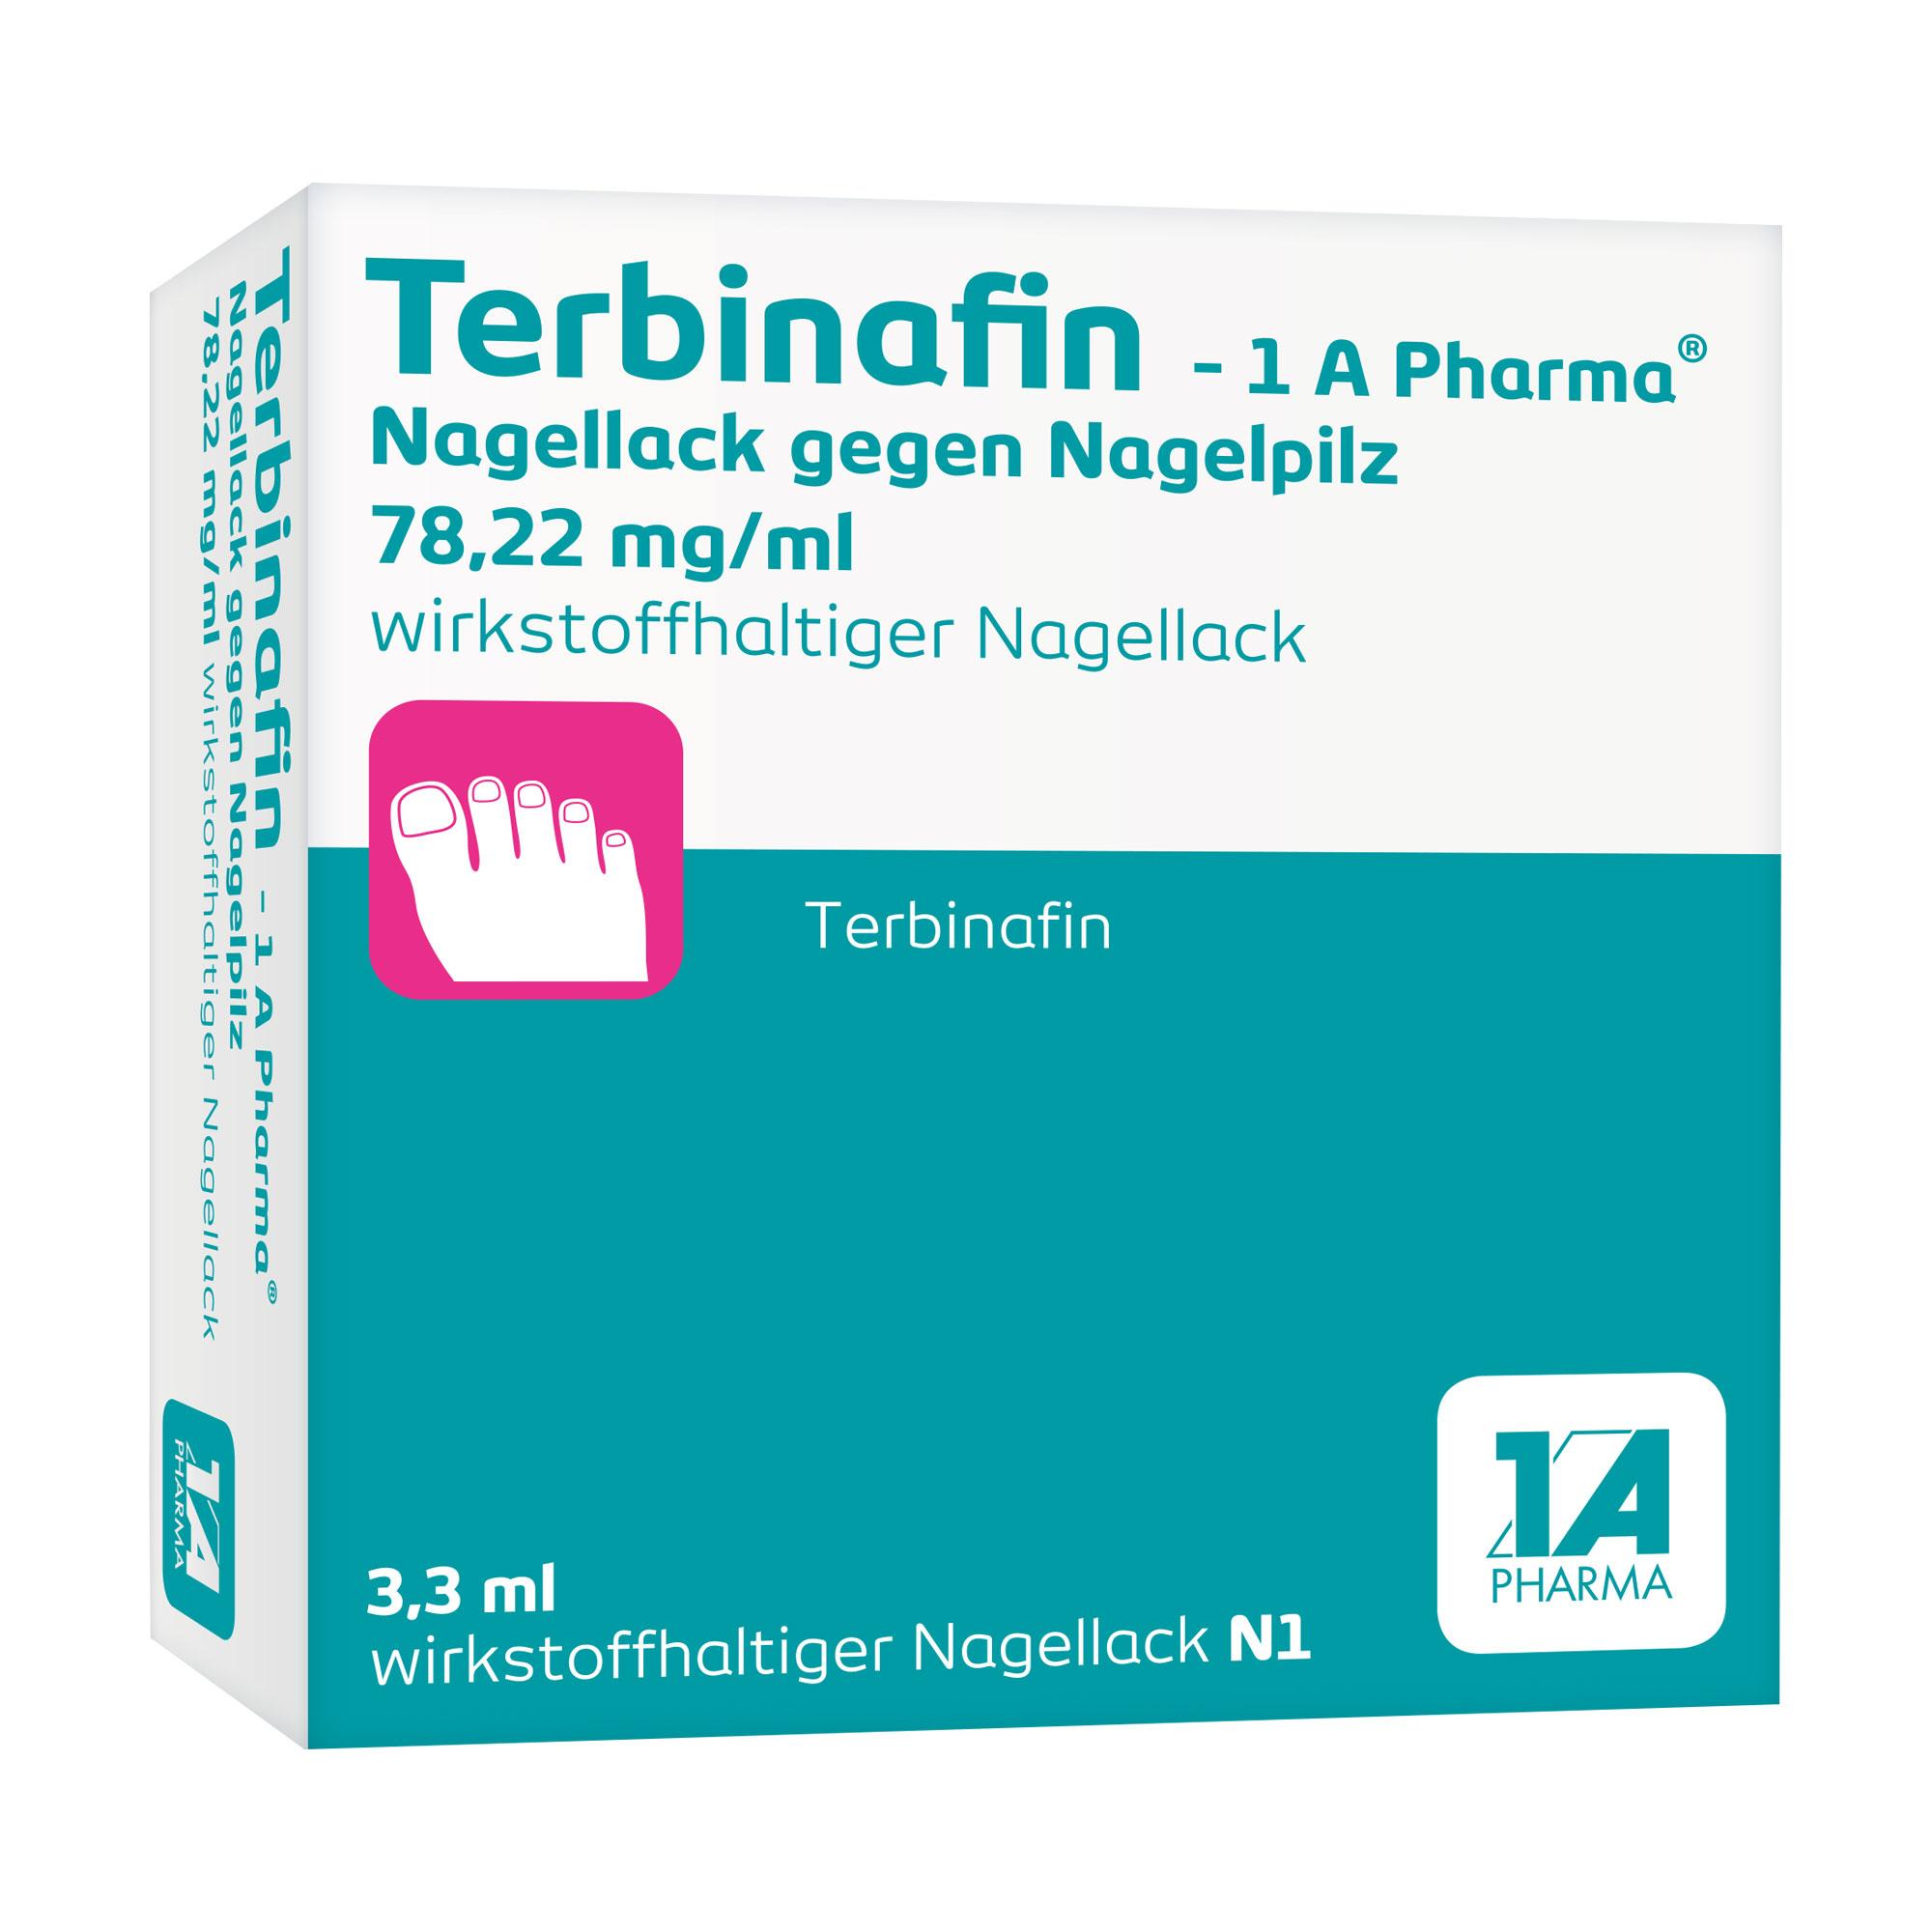 Terbinafin - 1 A Pharma Nagellack gegen Nagelpilz